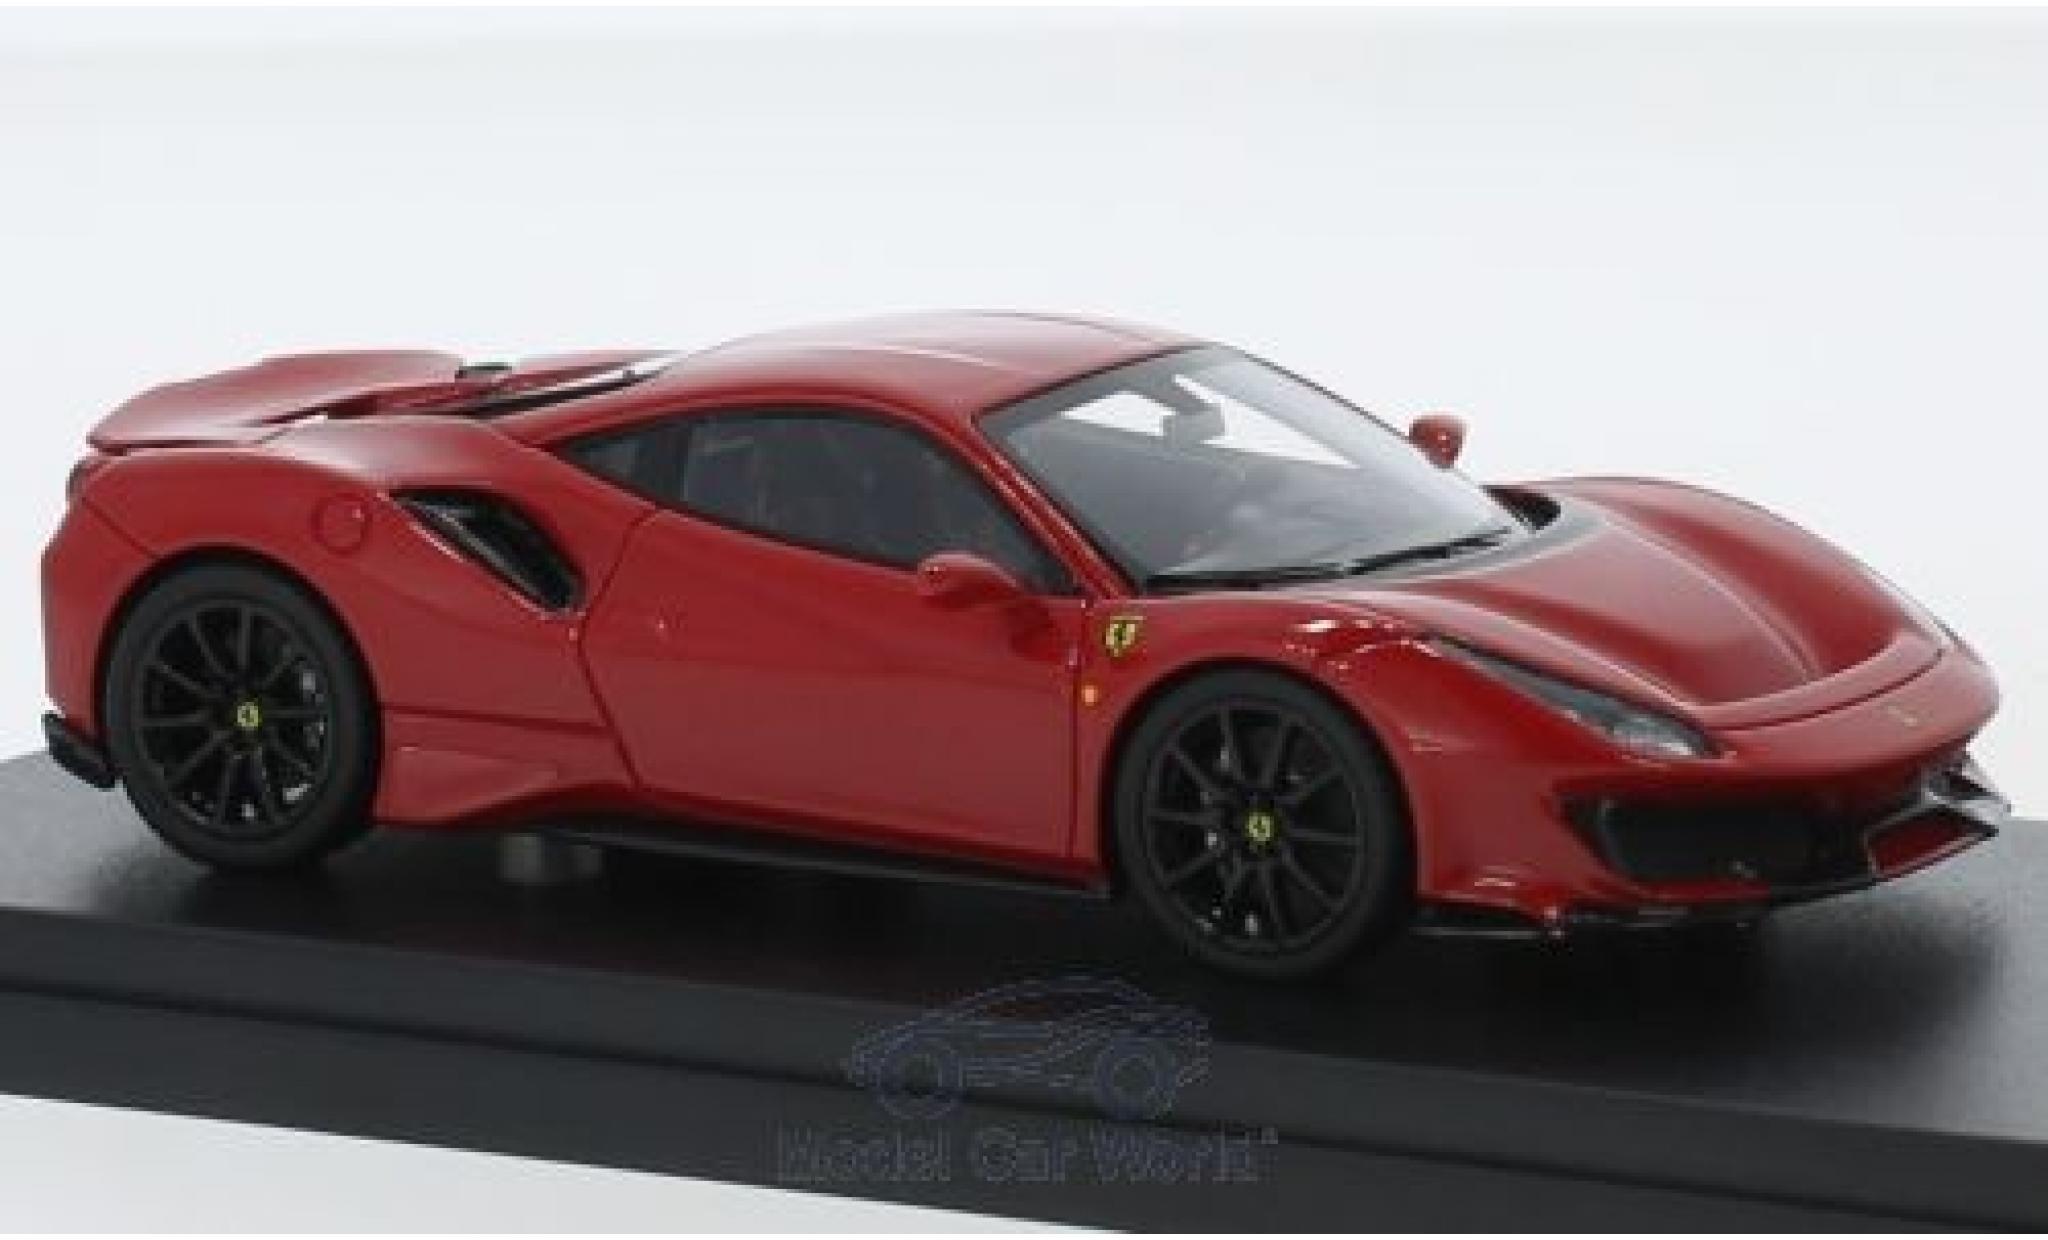 Ferrari 488 1/43 Look Smart Pista rot